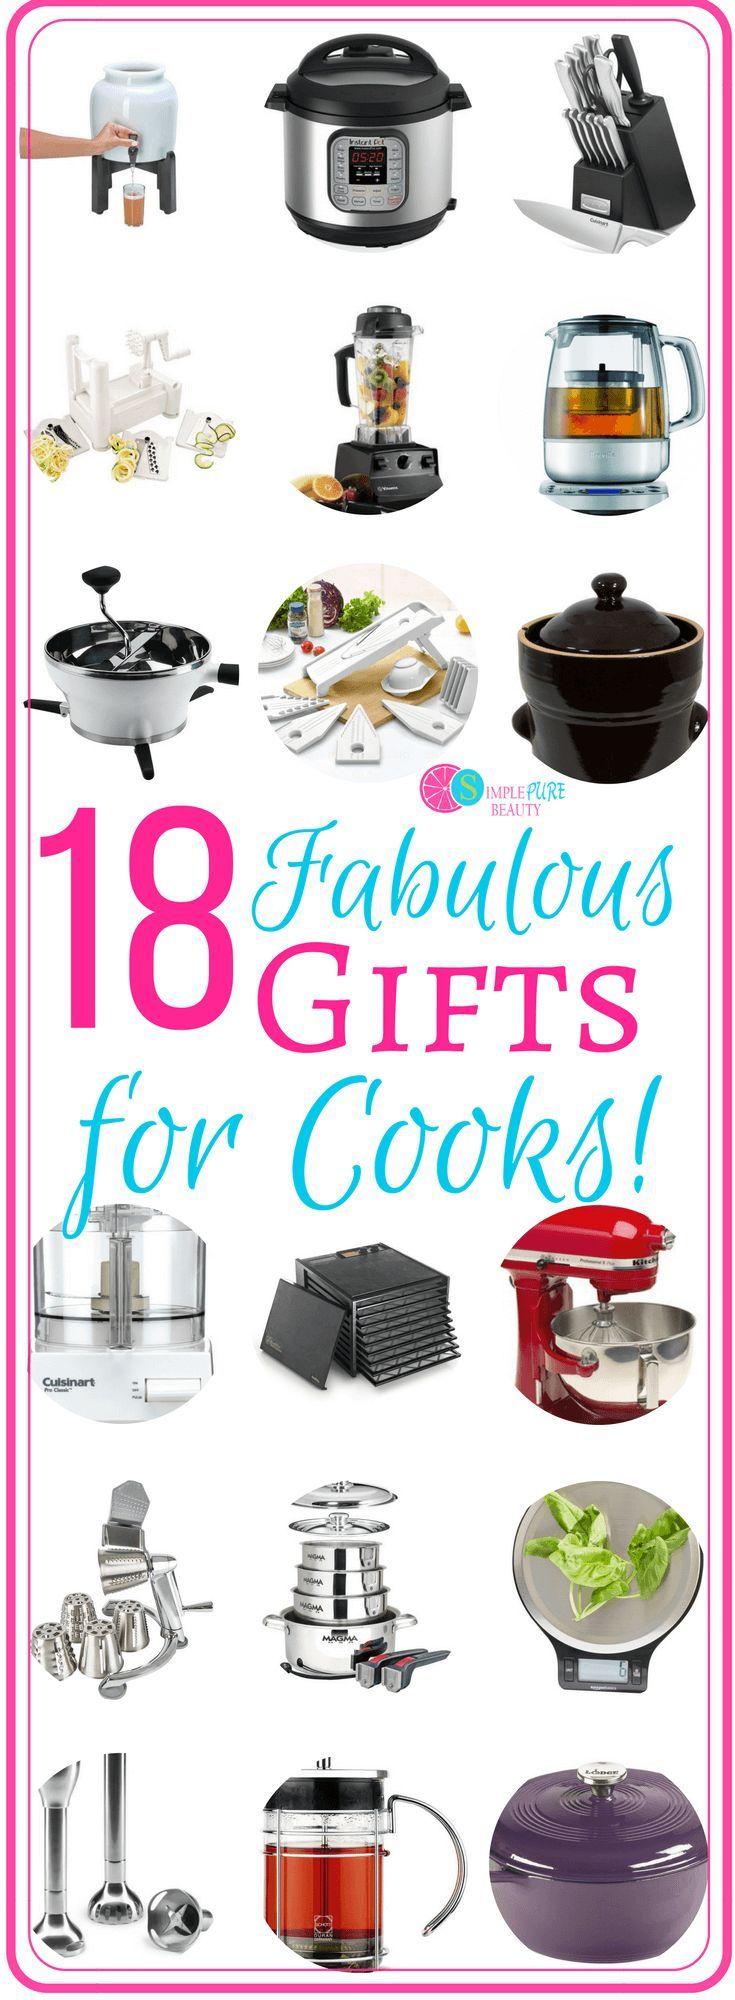 174 best DIY Gift Ideas images on Pinterest | Gift ideas, Diy ...